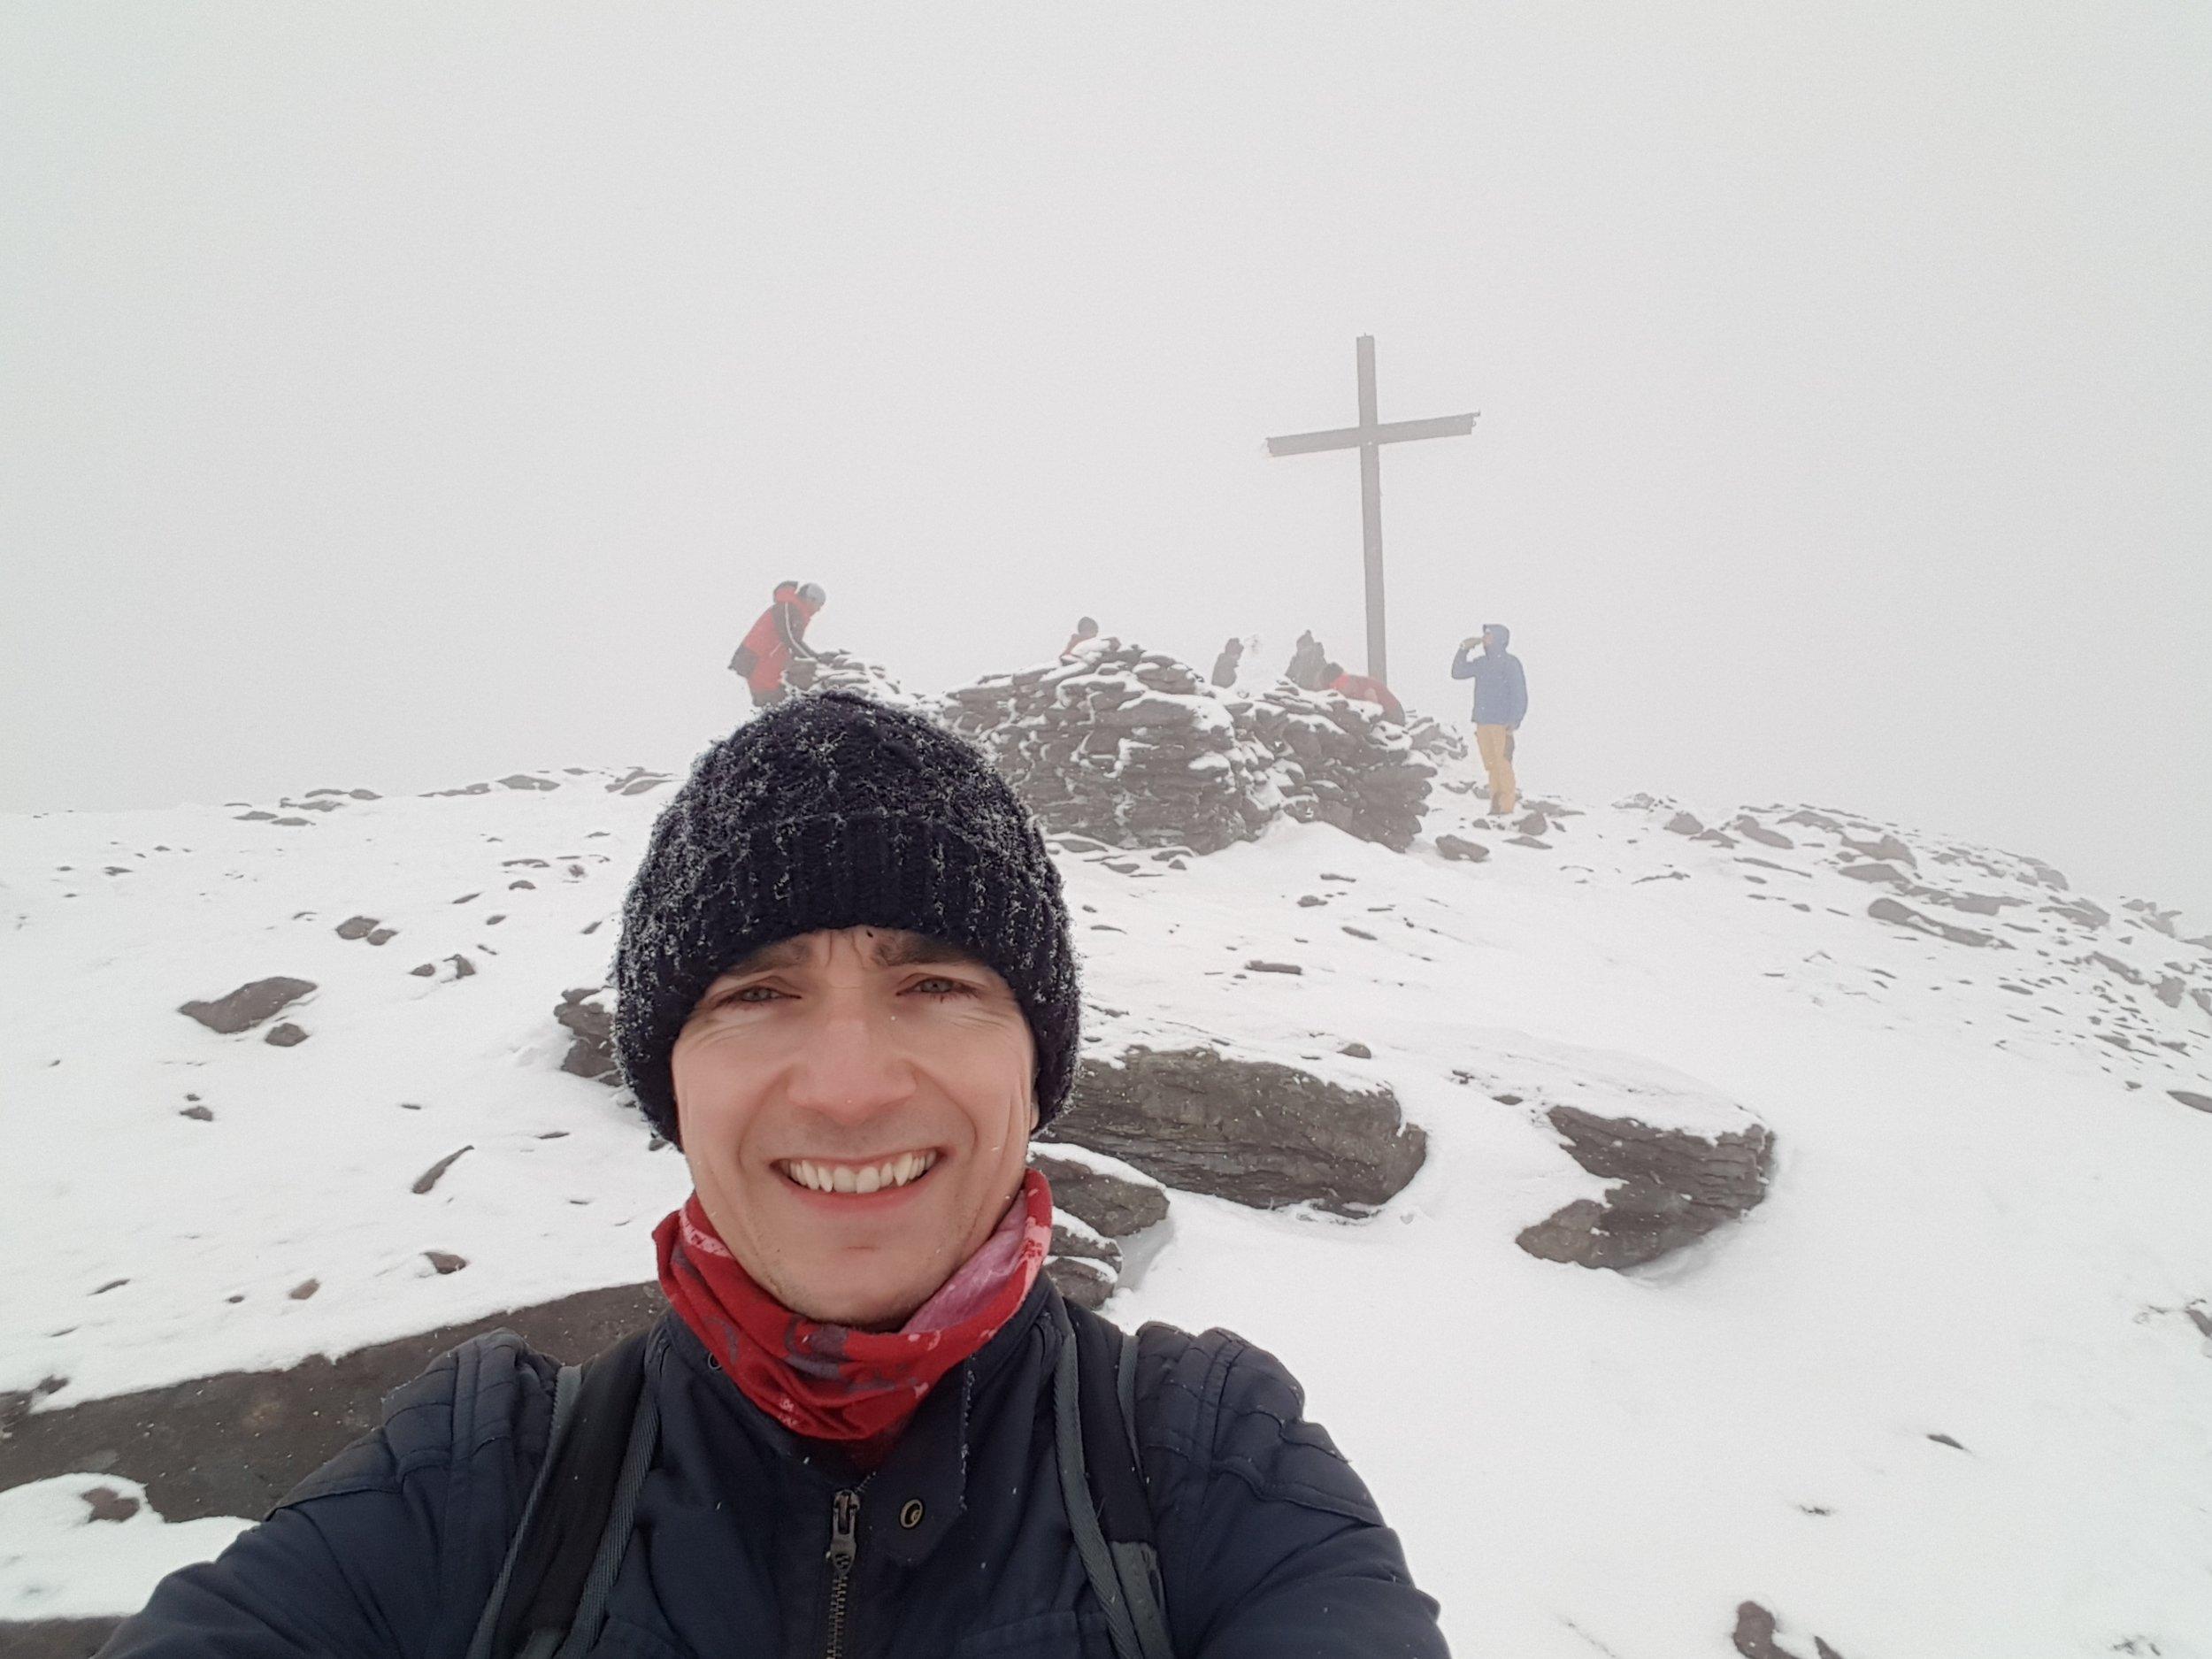 The summit of Carrauntoohil county Kerry